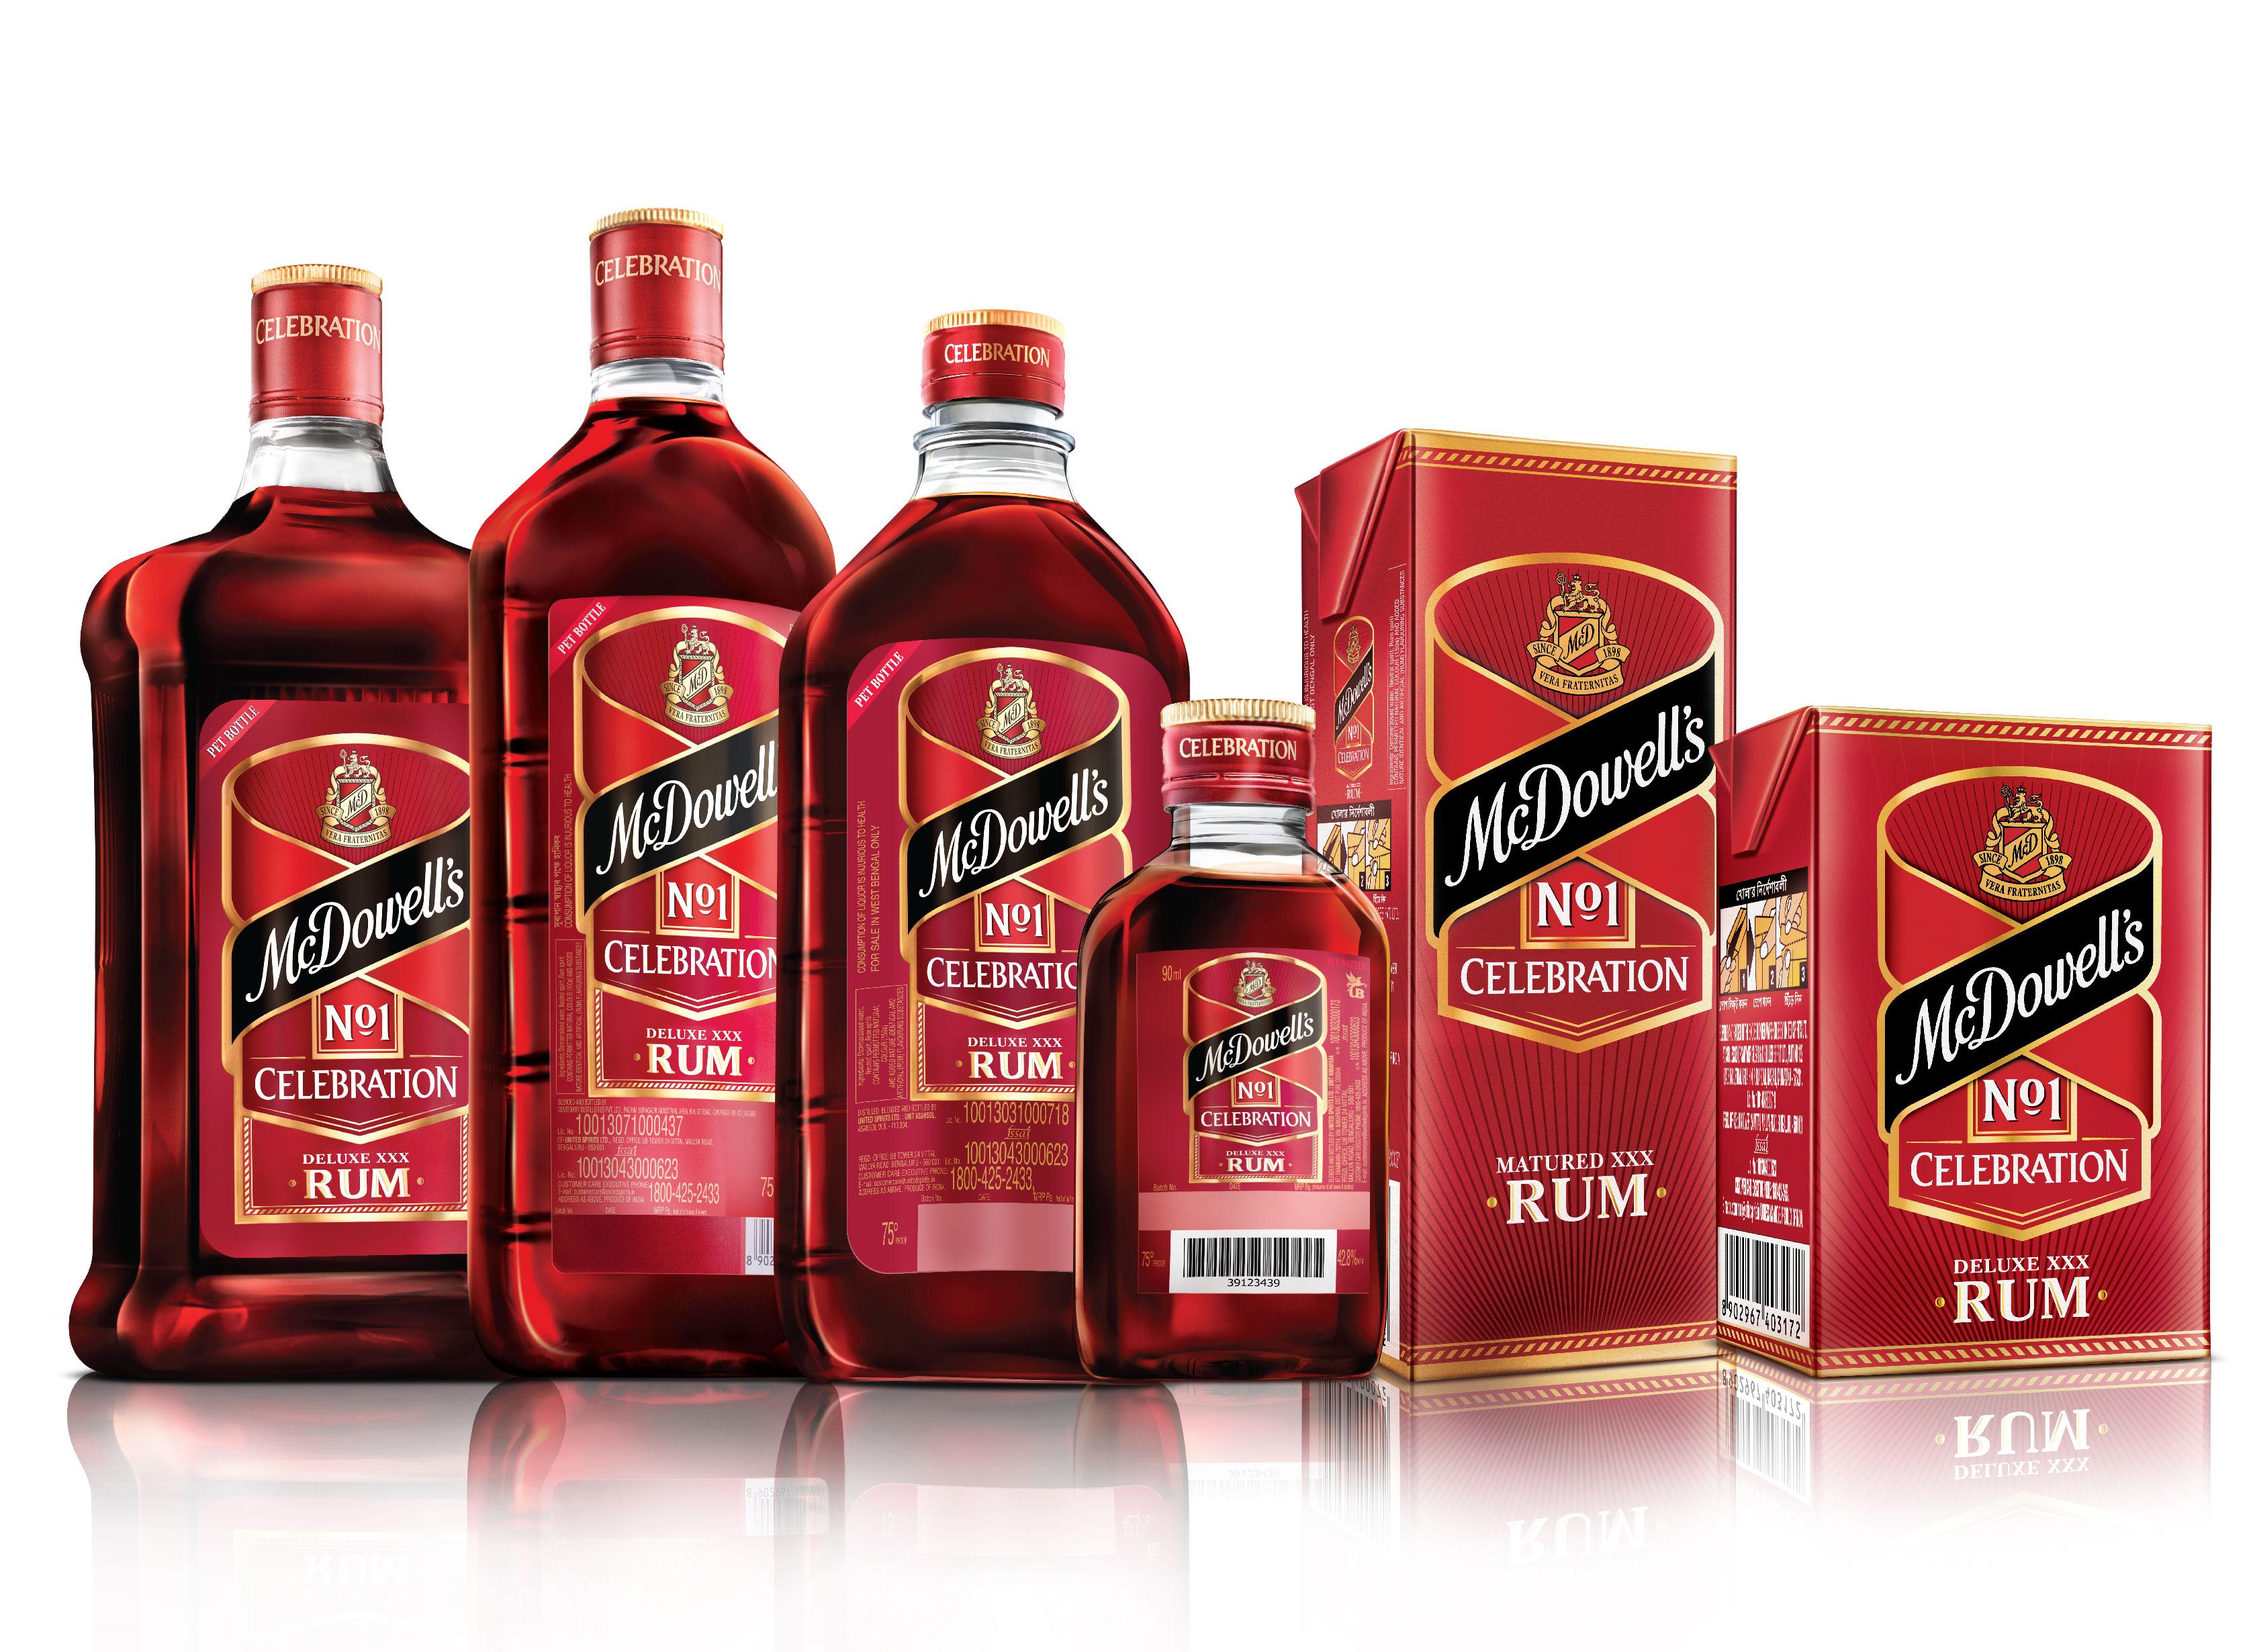 McDowells Rum